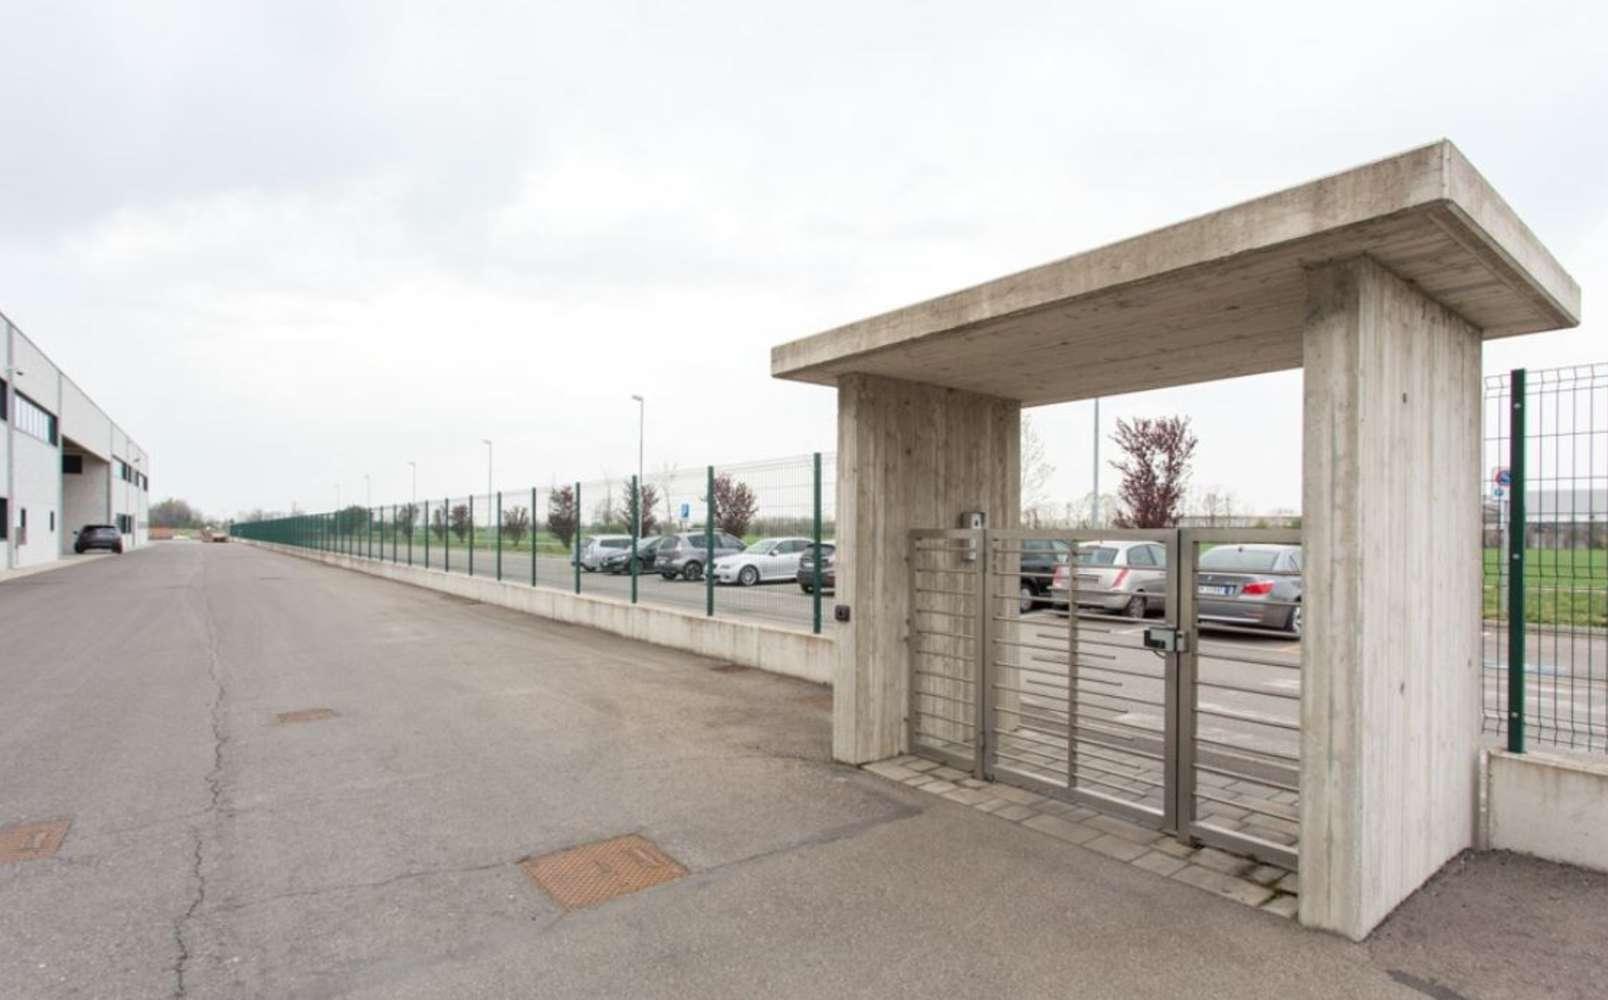 Magazzini industriali e logistici Piacenza, 29122 - Piacenza - Casoni - 10810260